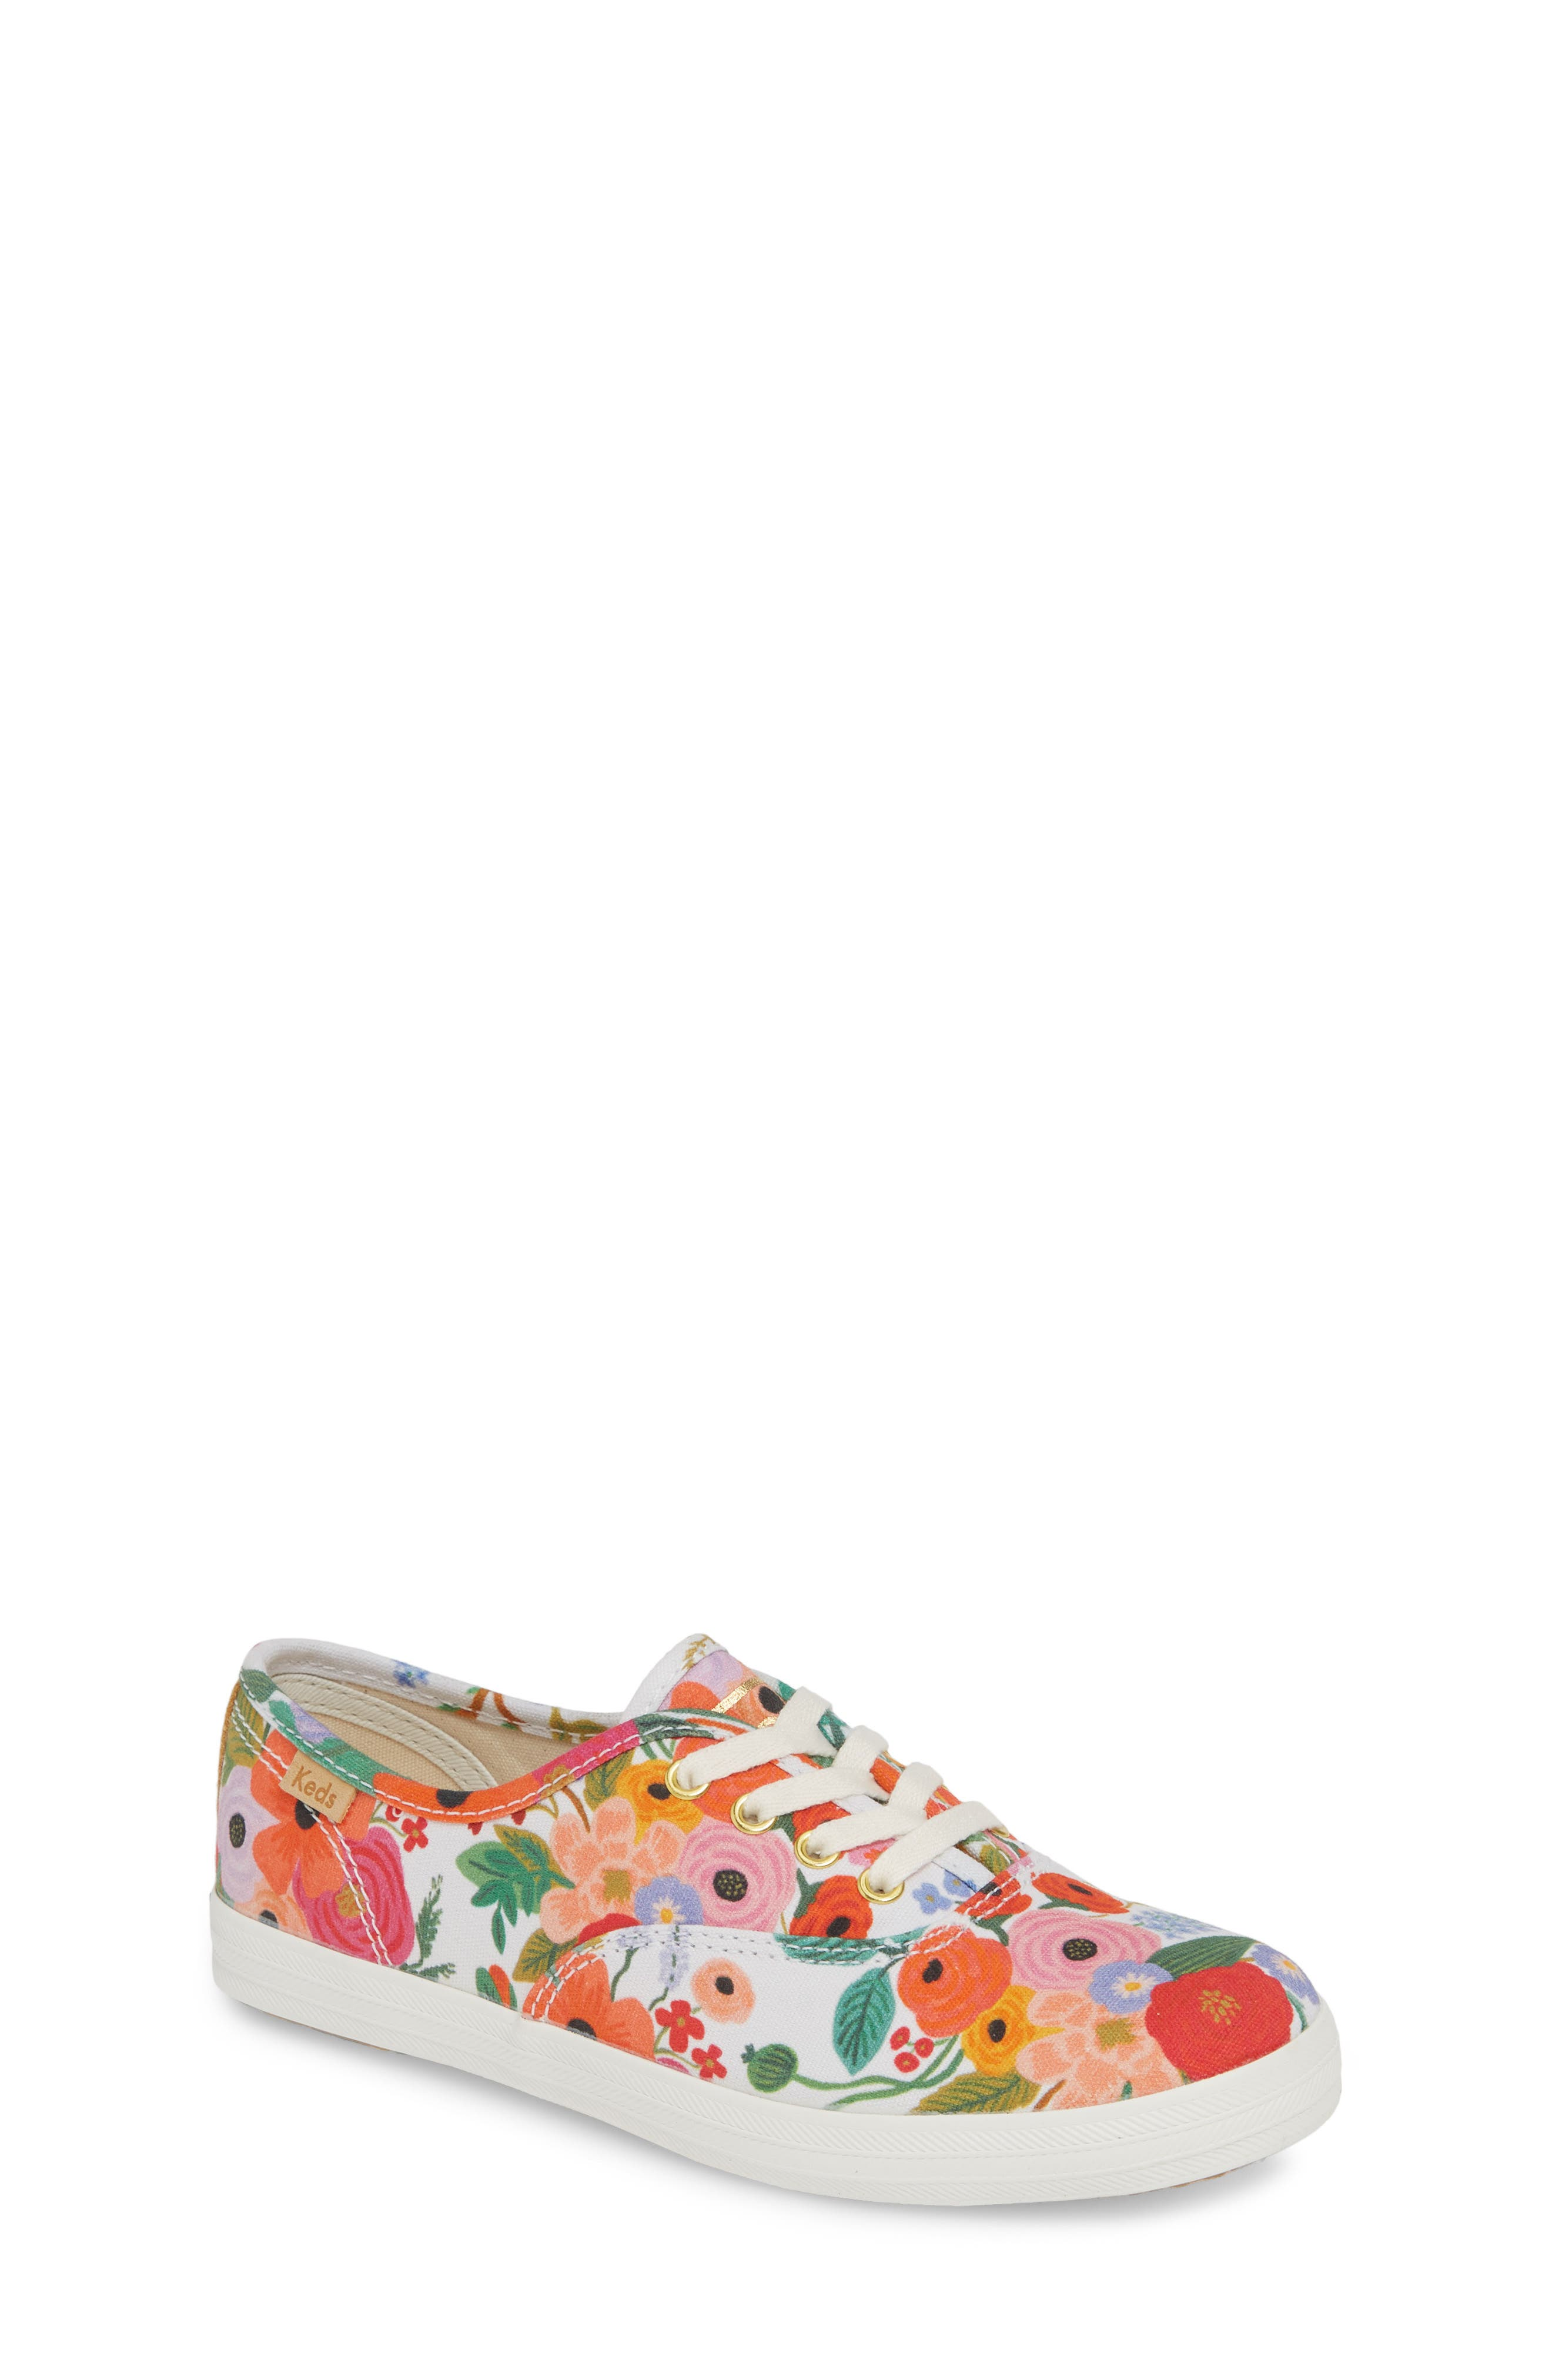 KEDS<SUP>®</SUP>, x Rifle Paper Co. Floral Print Champion Sneaker, Main thumbnail 1, color, GARDEN PARTY